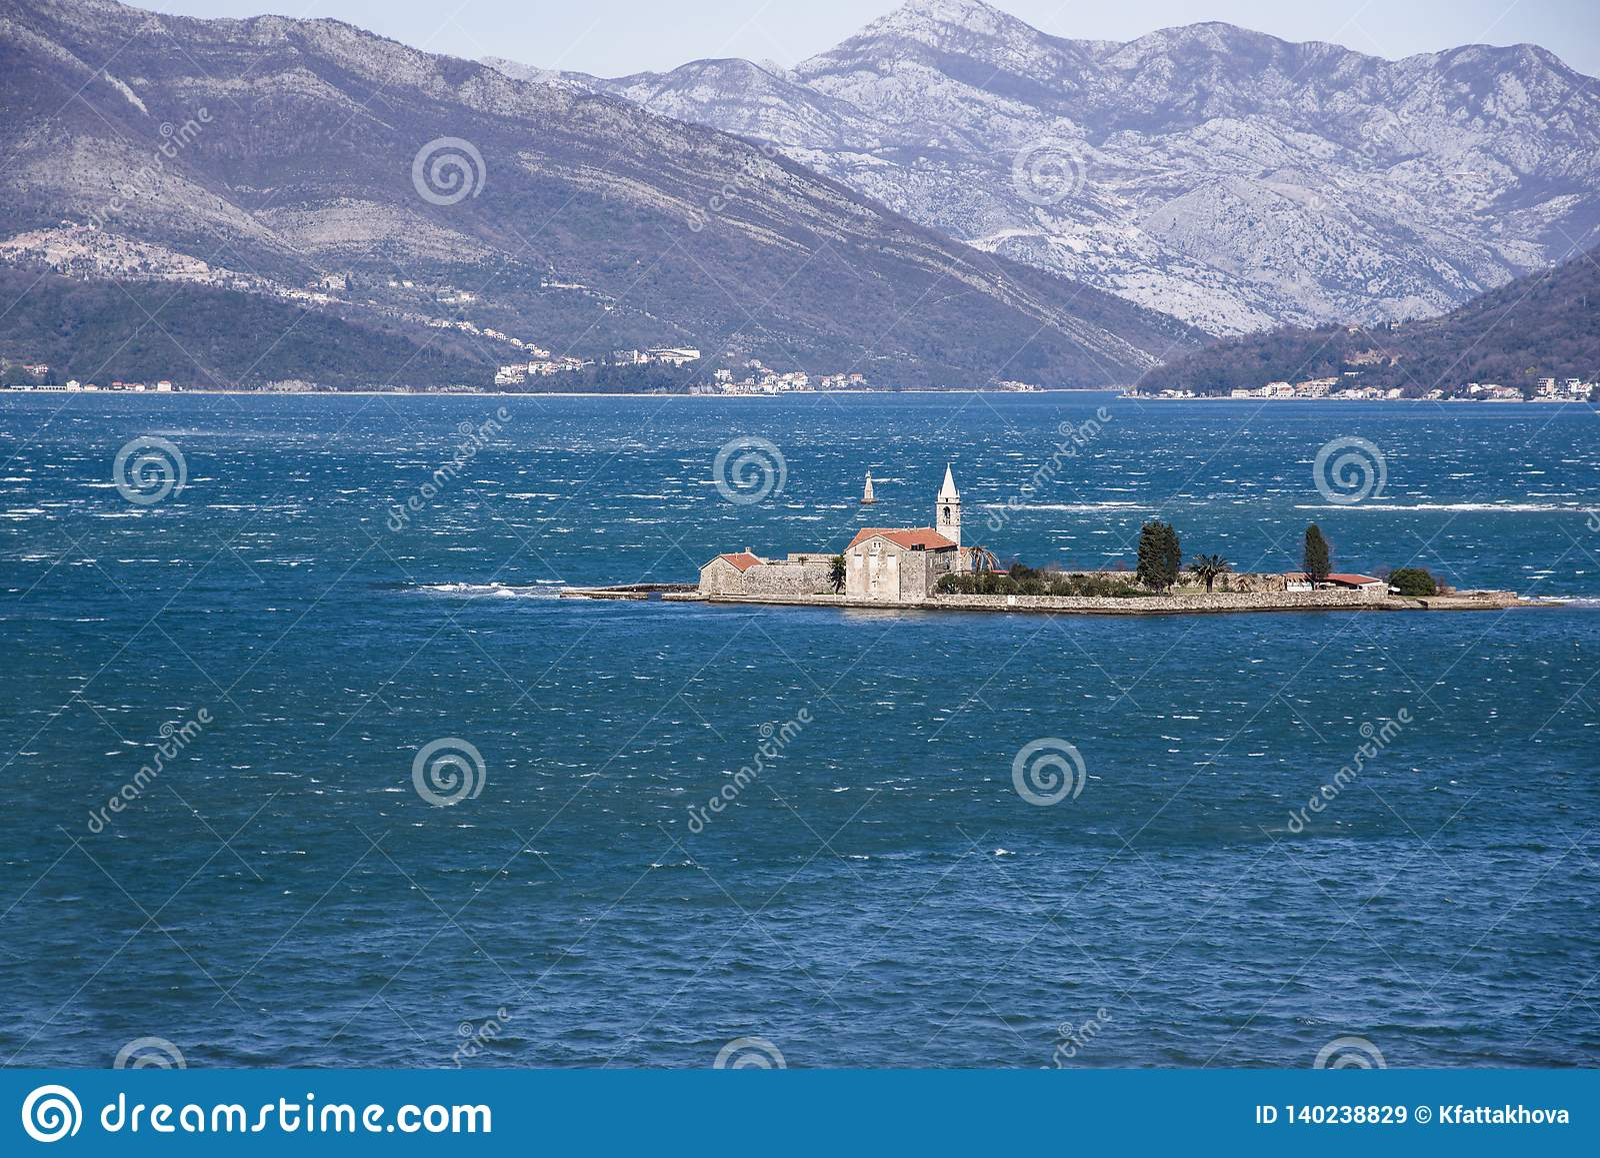 Взгляд залива Milo Gospa od острова Otok Tivat, Черногории, на ветреный зимний день 2019-02-23 11:49